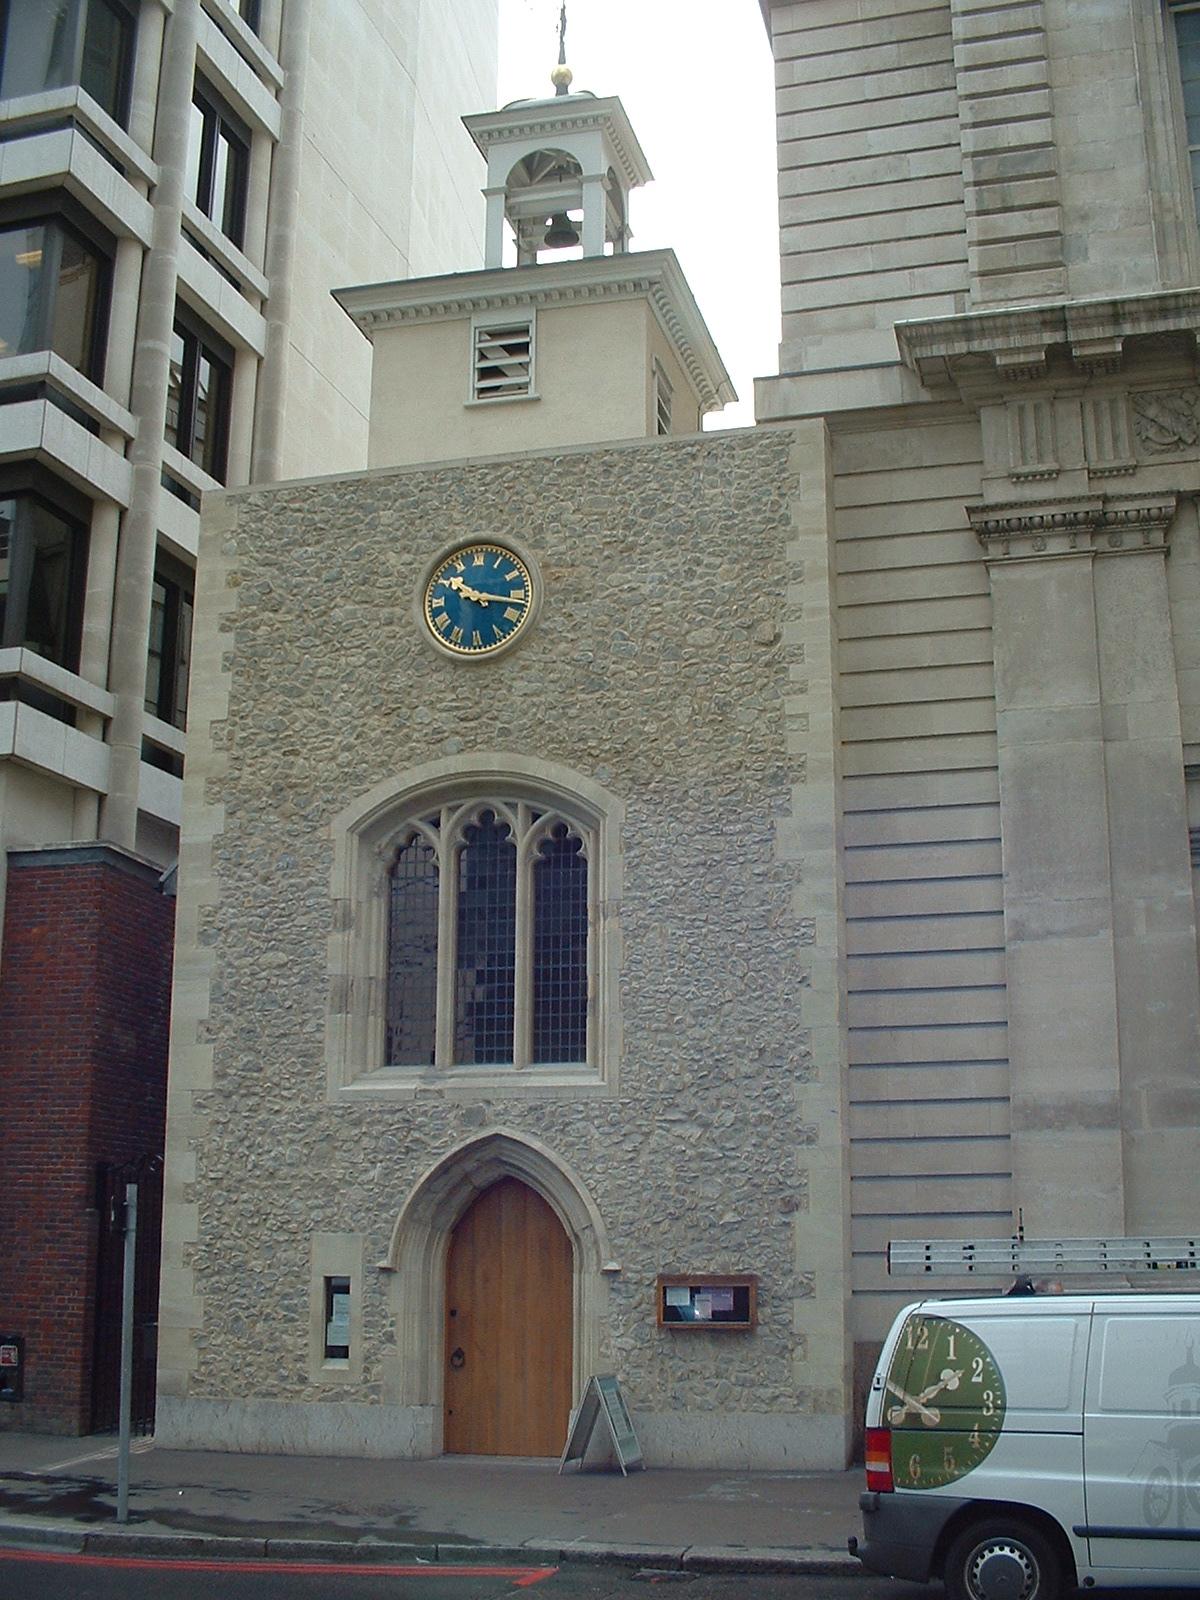 Clock outside church